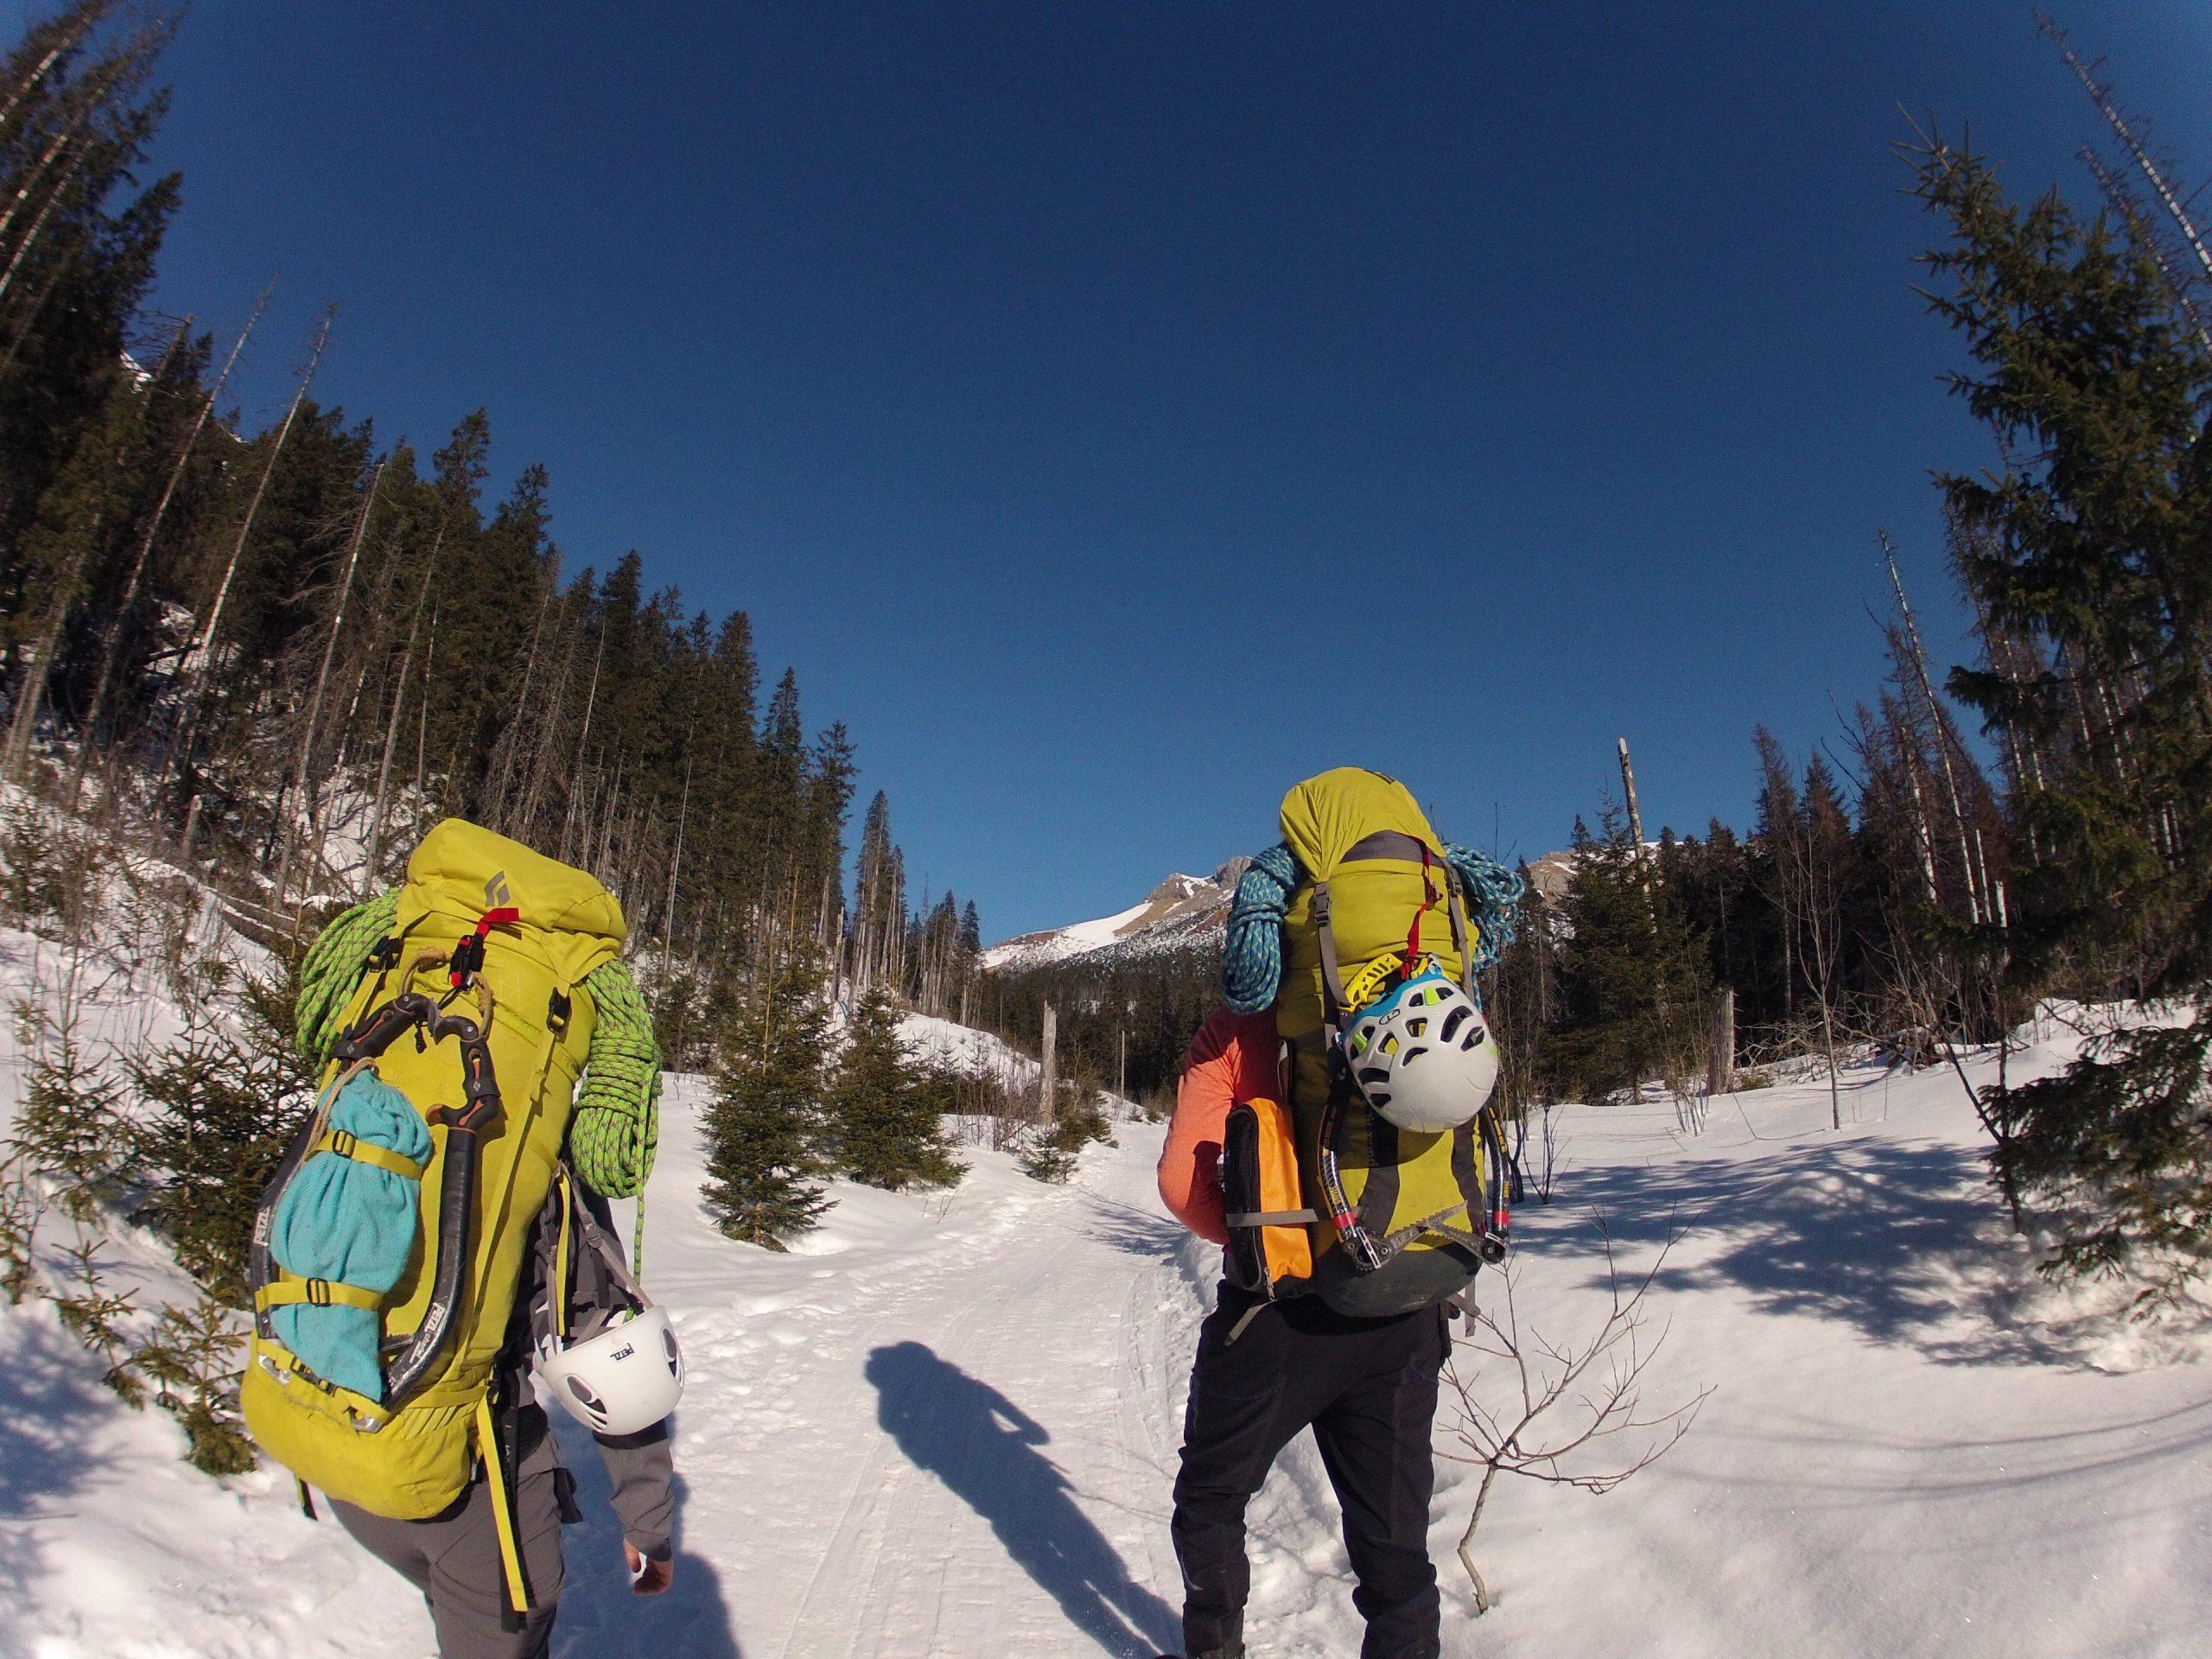 kelione i kalnus